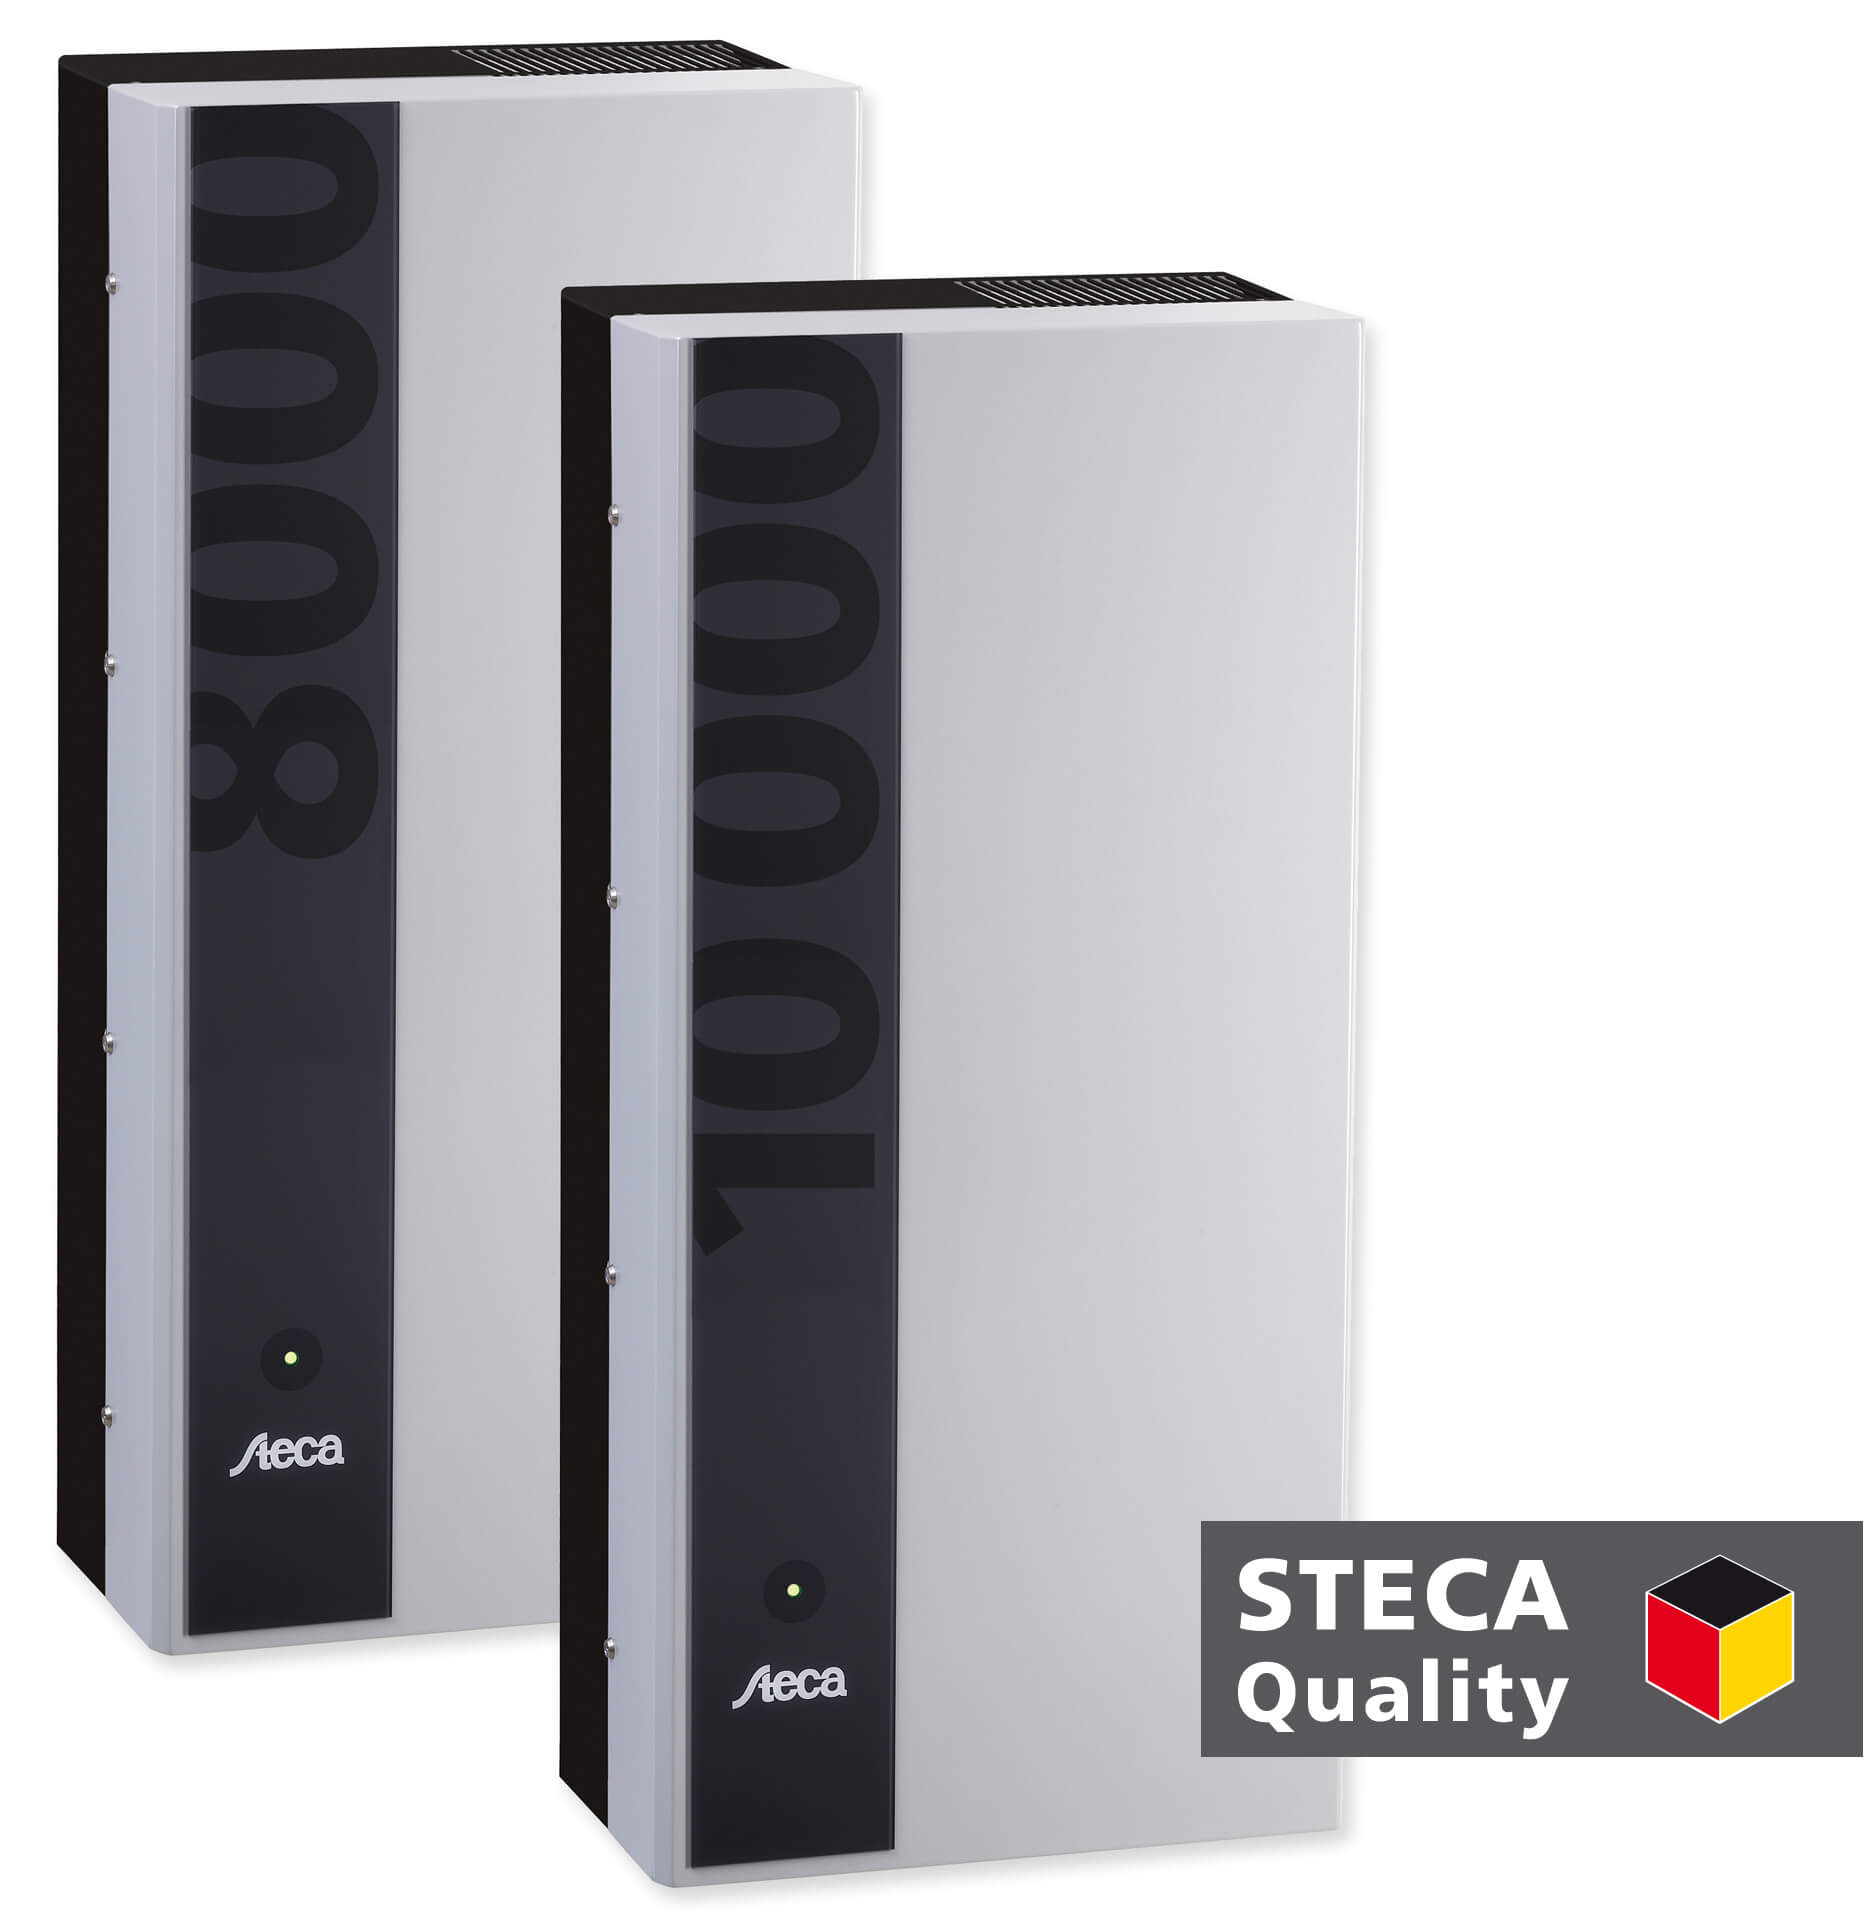 StecaGrid 8000 1000 3ph Produktbild Homepage.jpg